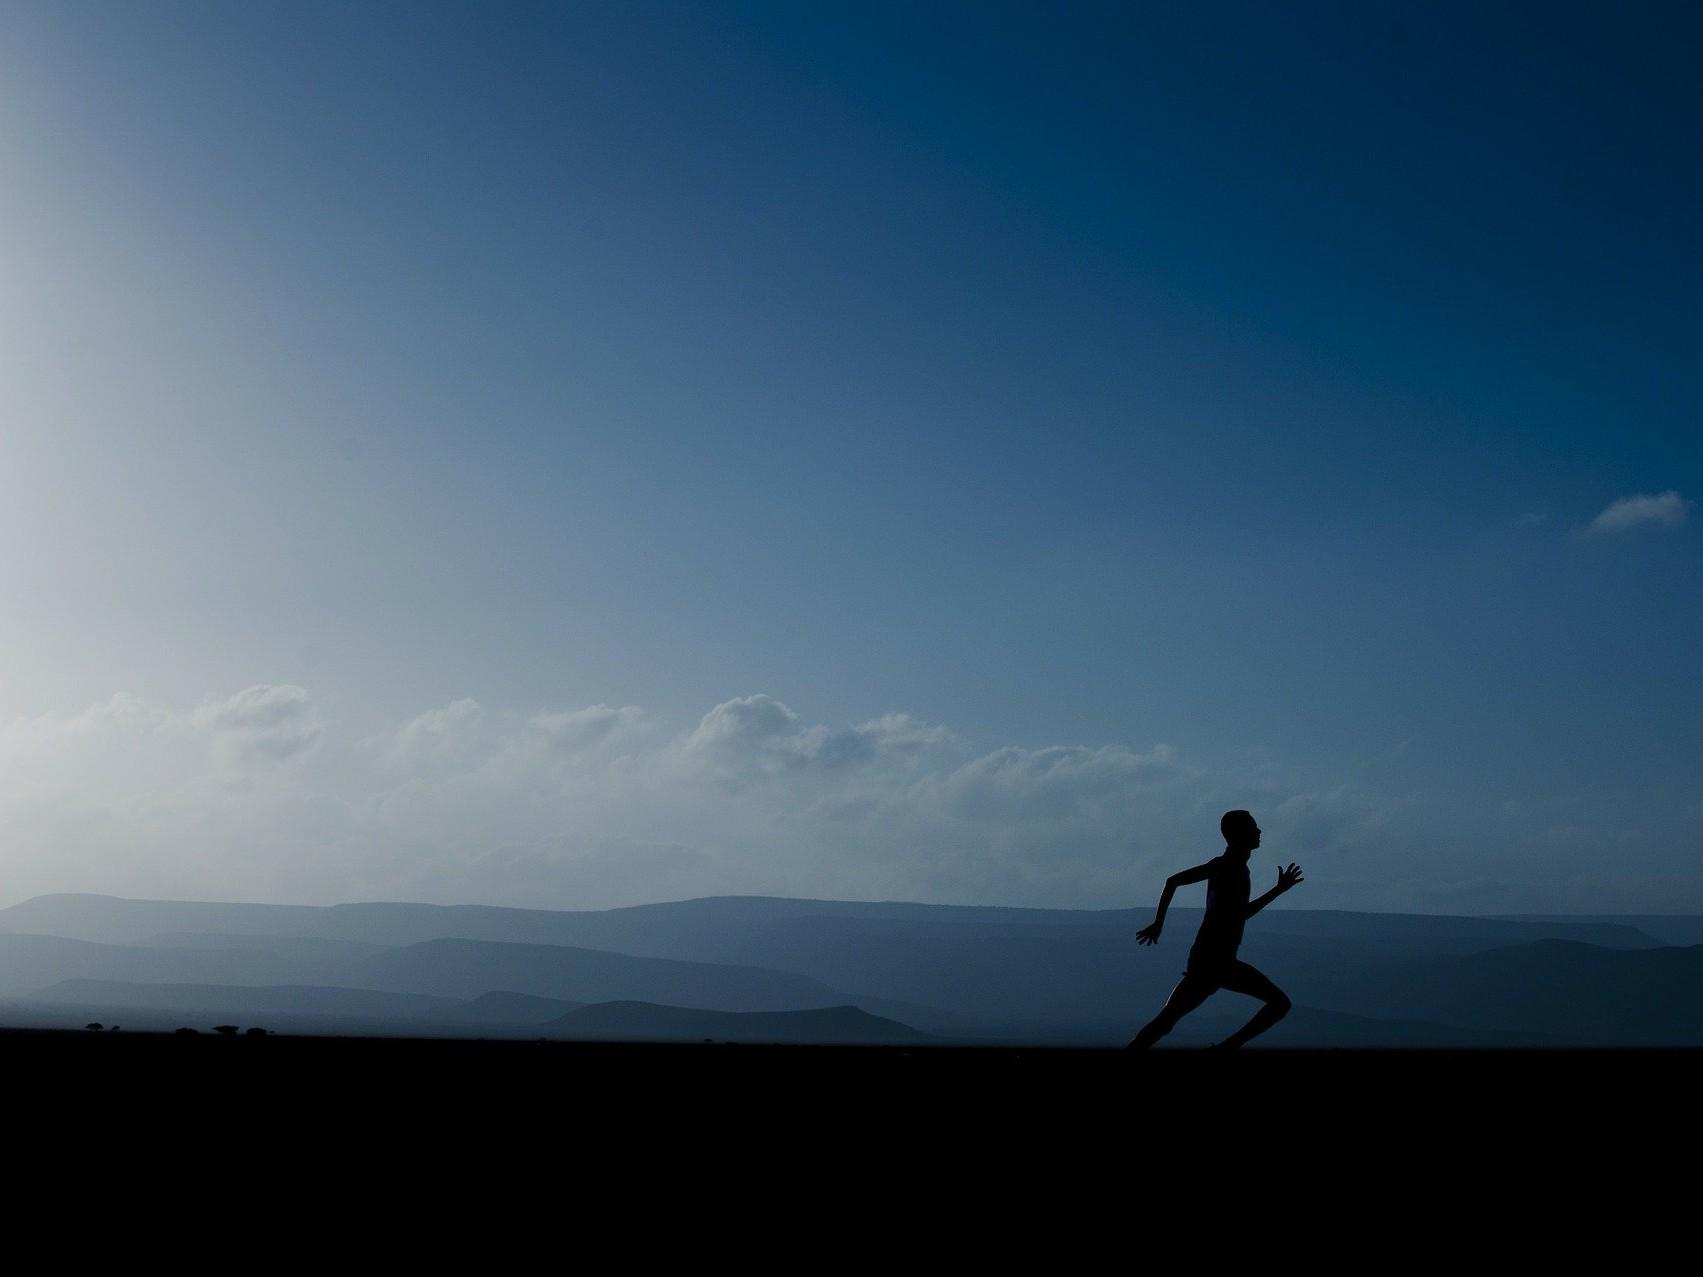 A runner to represent John training for the London marathon.